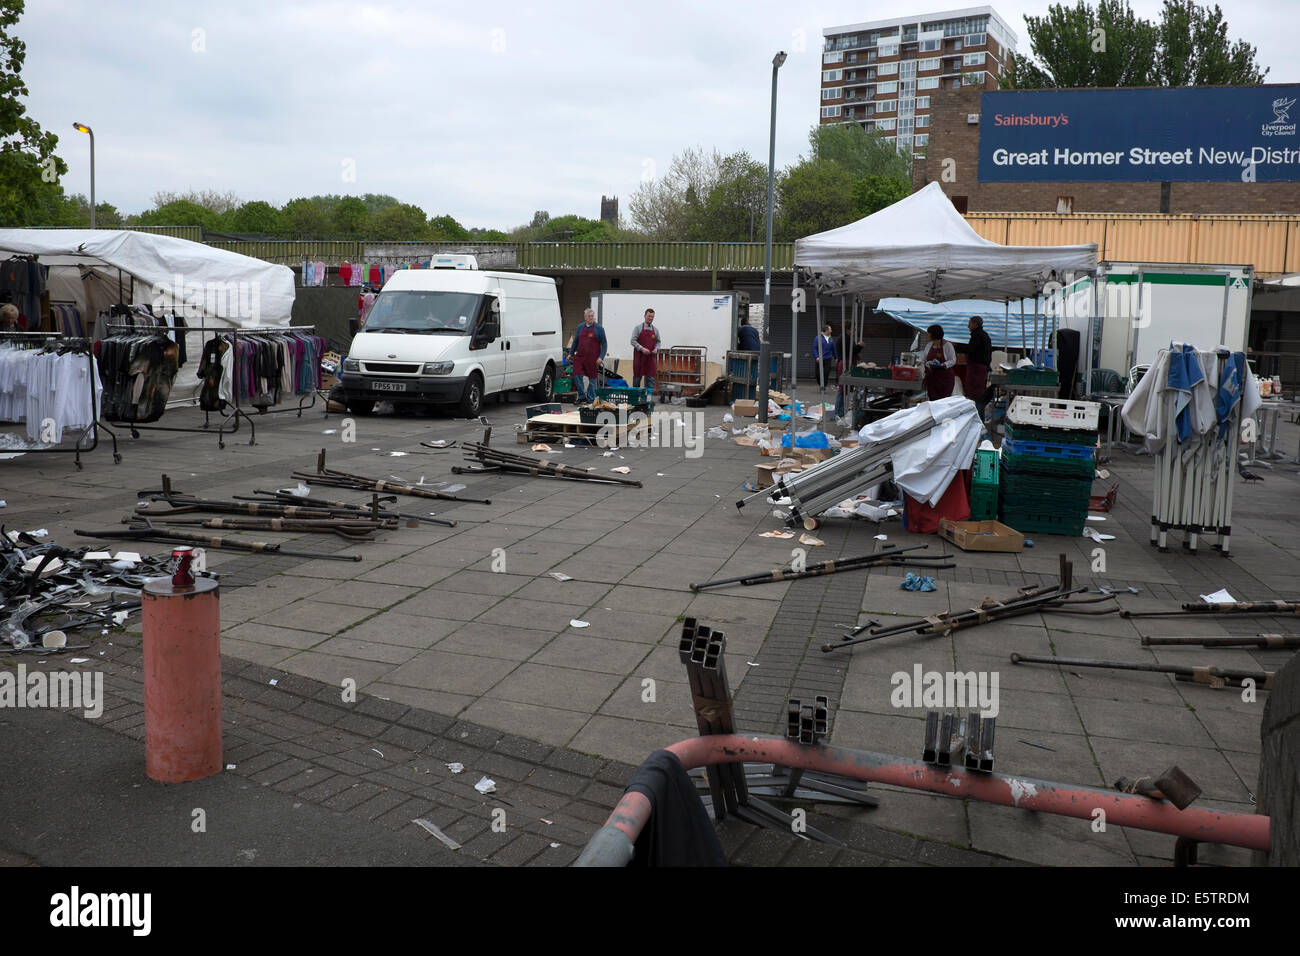 Dismantling Market Stalls Saturday Street Market - Stock Image